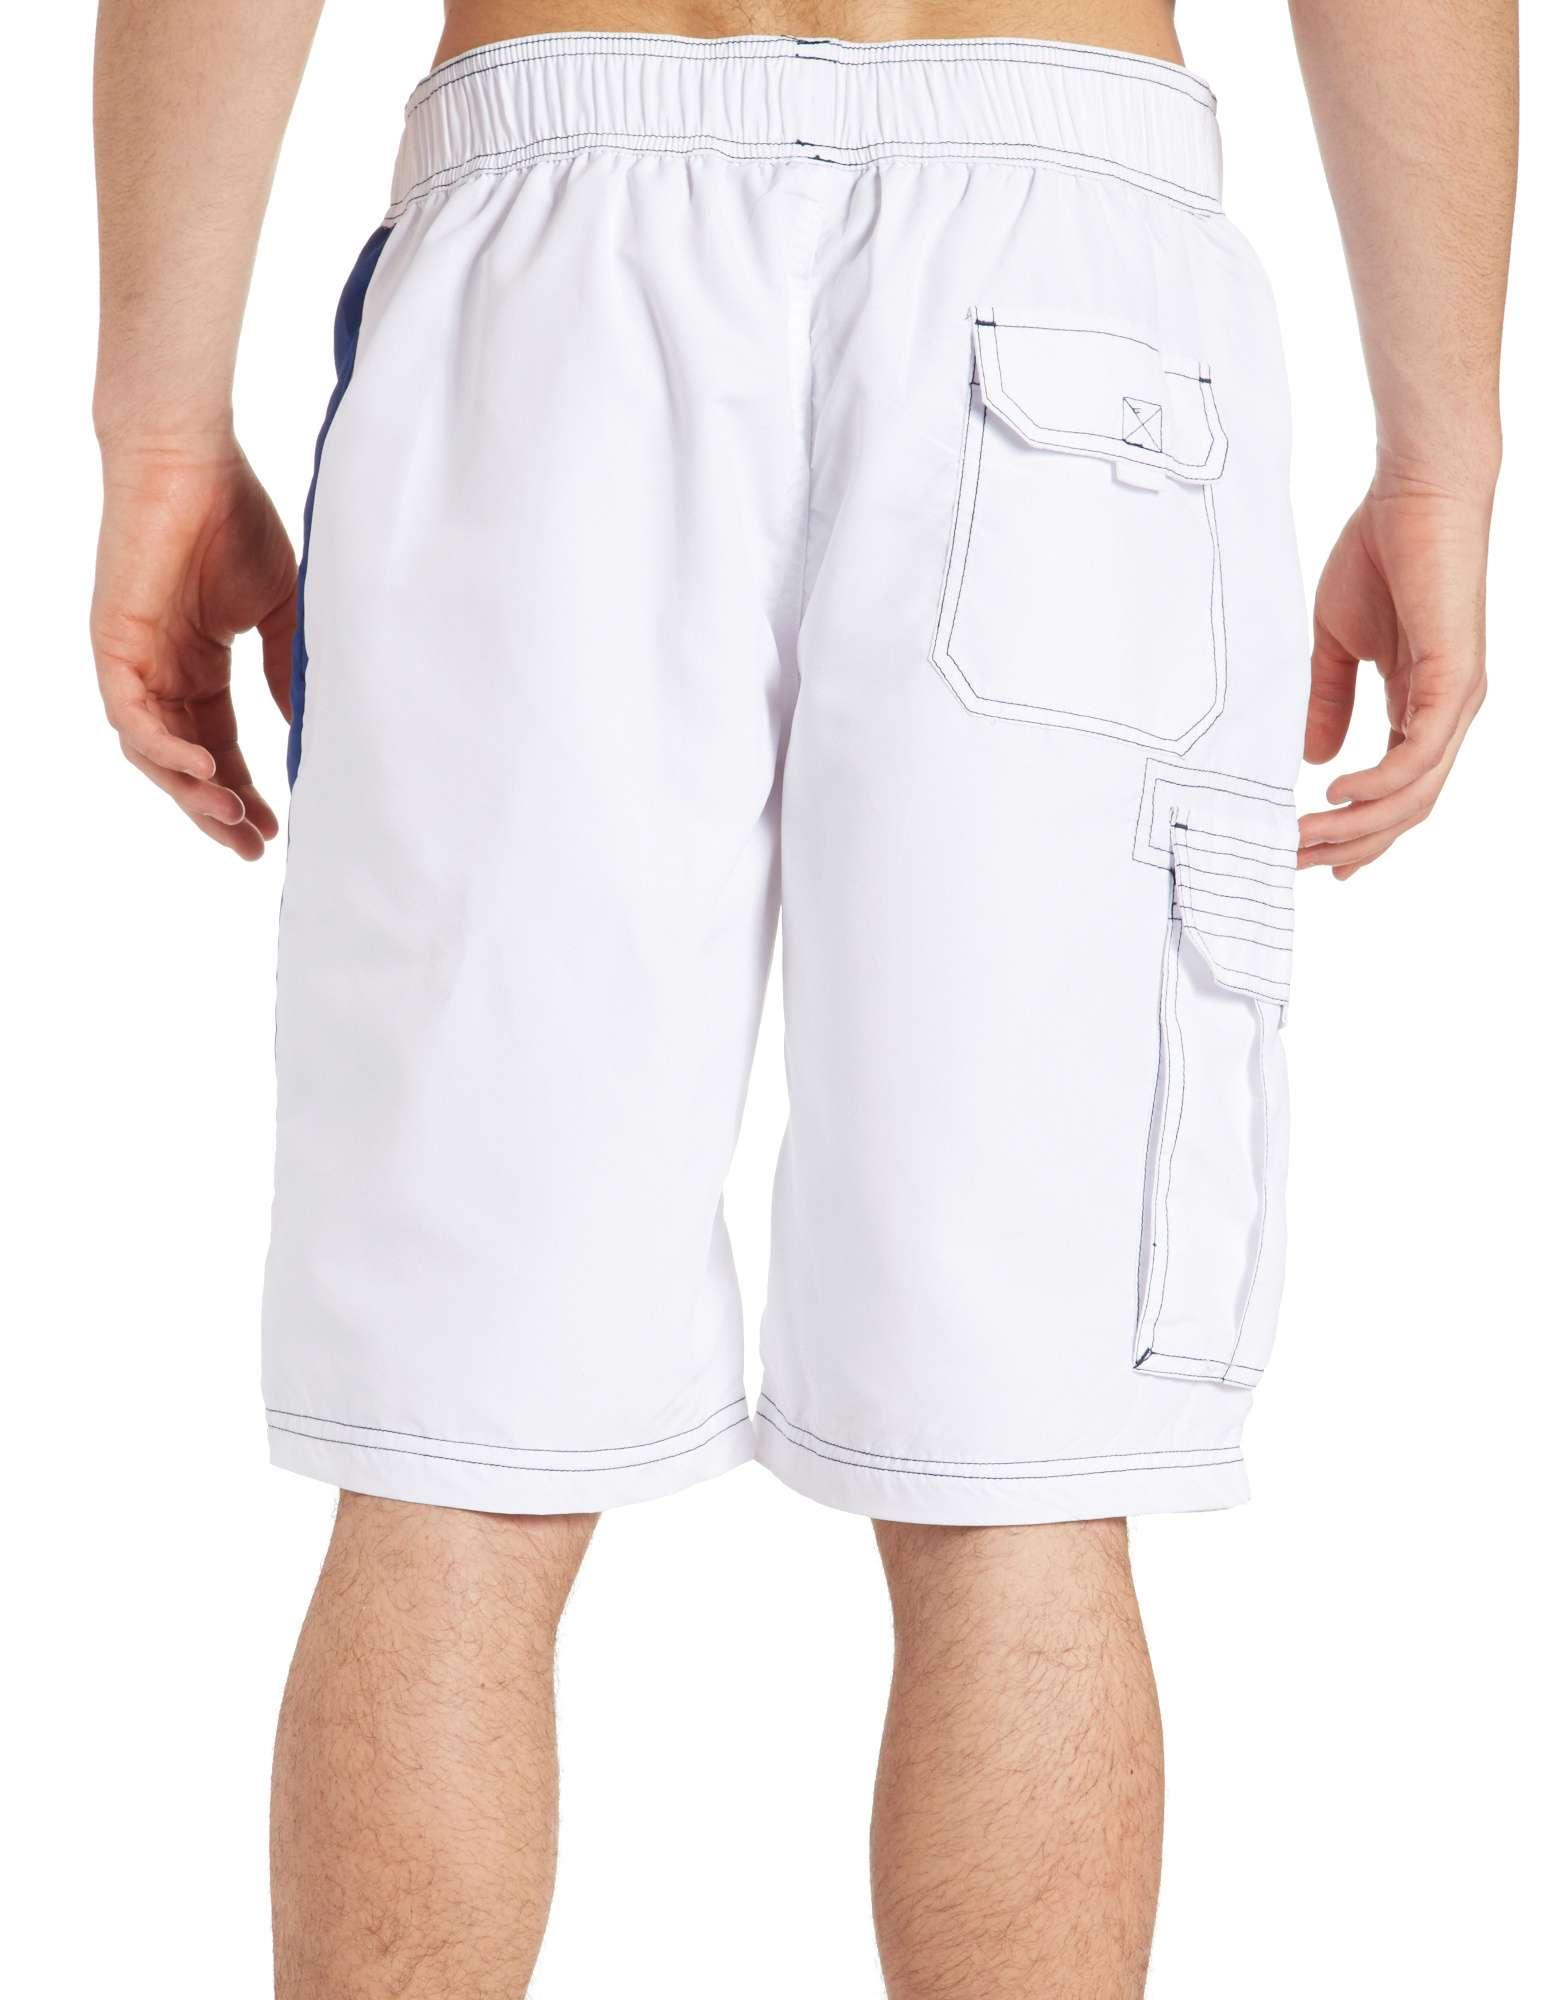 McKenzie Whitby Board Shorts